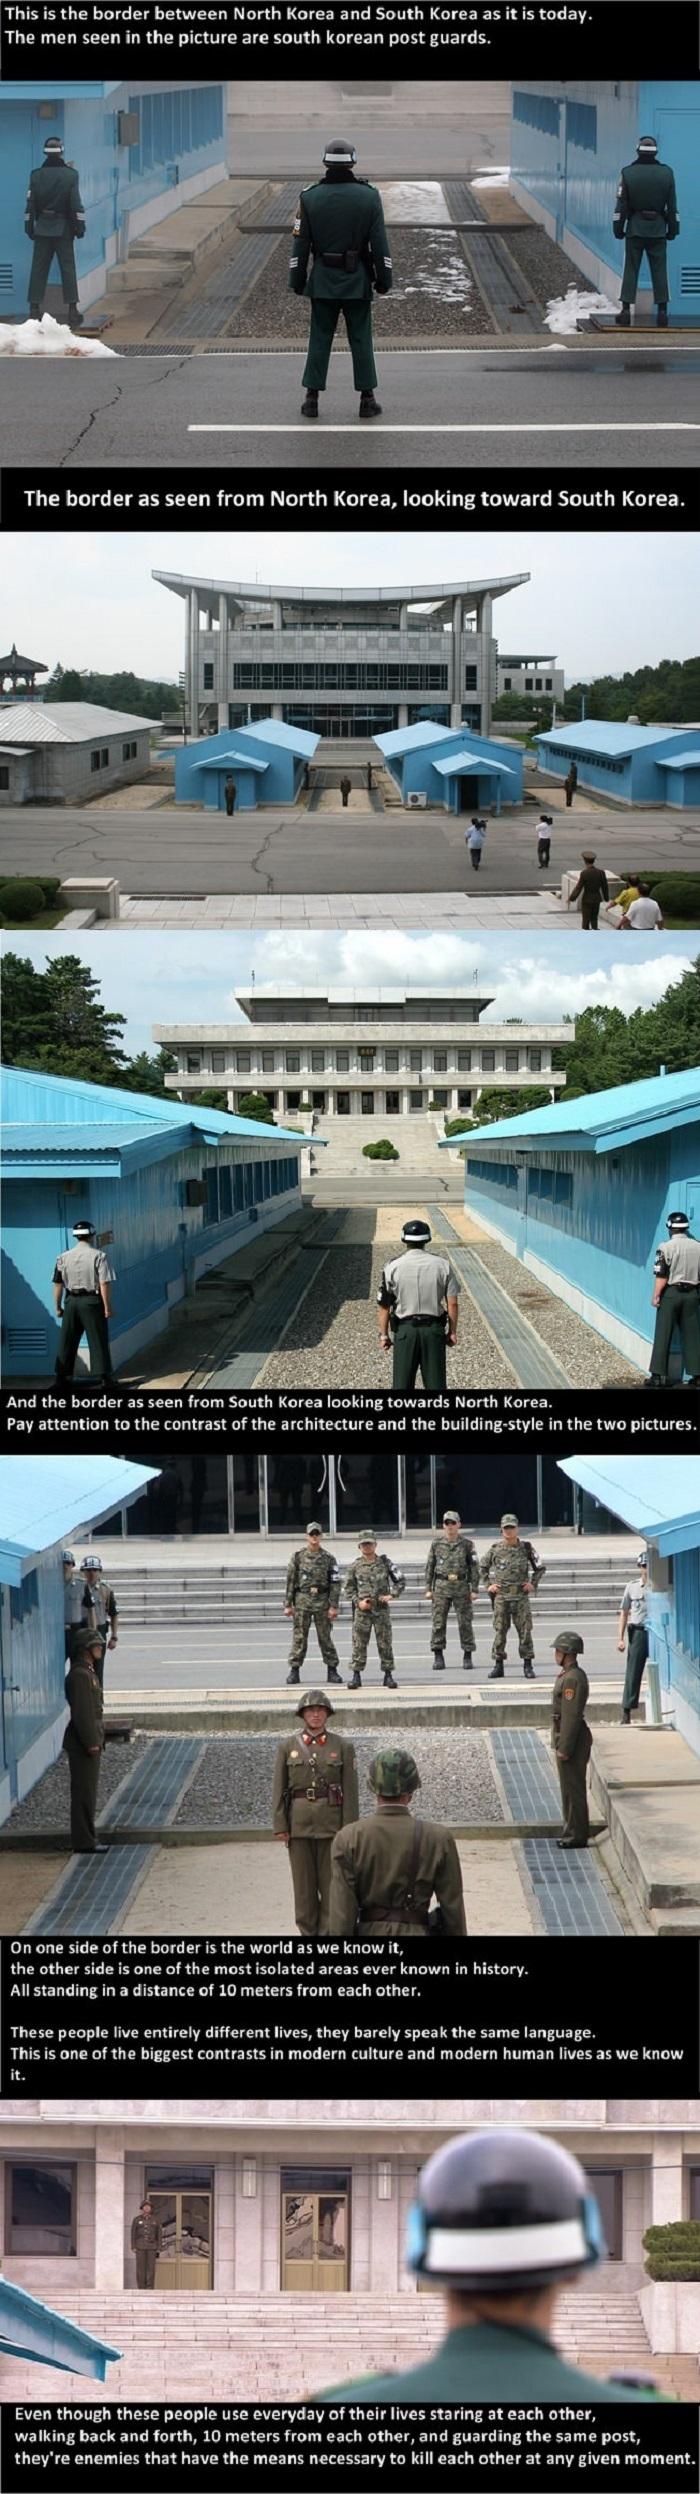 North & South Korea border